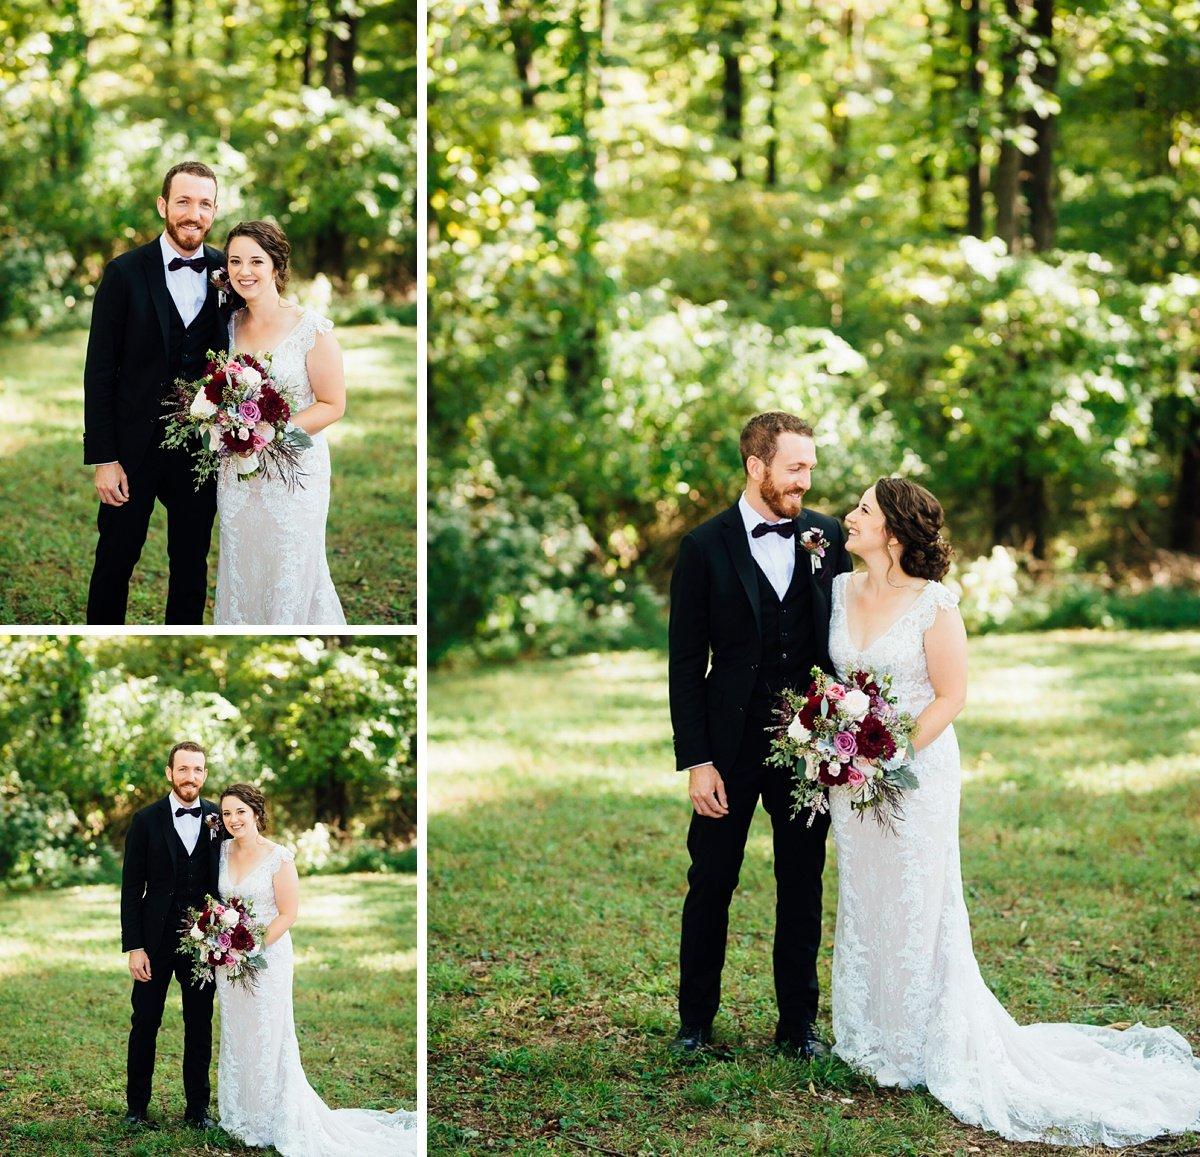 clarksville-wedding-couple Old Glory Distilling Co Wedding   Clarksville, TN   Matt + Shannon